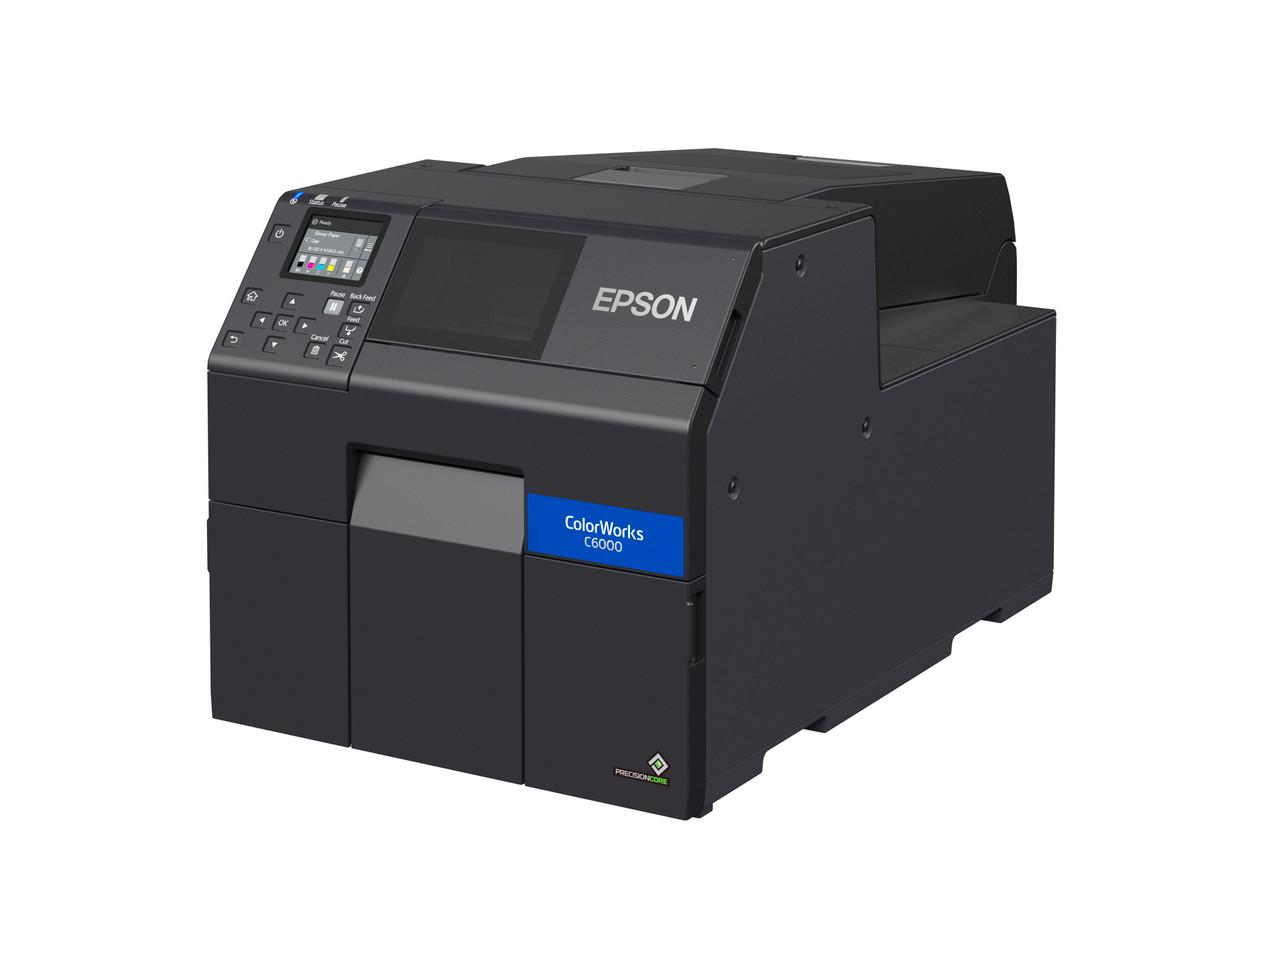 Epson ColorWorks C6000A 4 inch color label printer - Autocutter